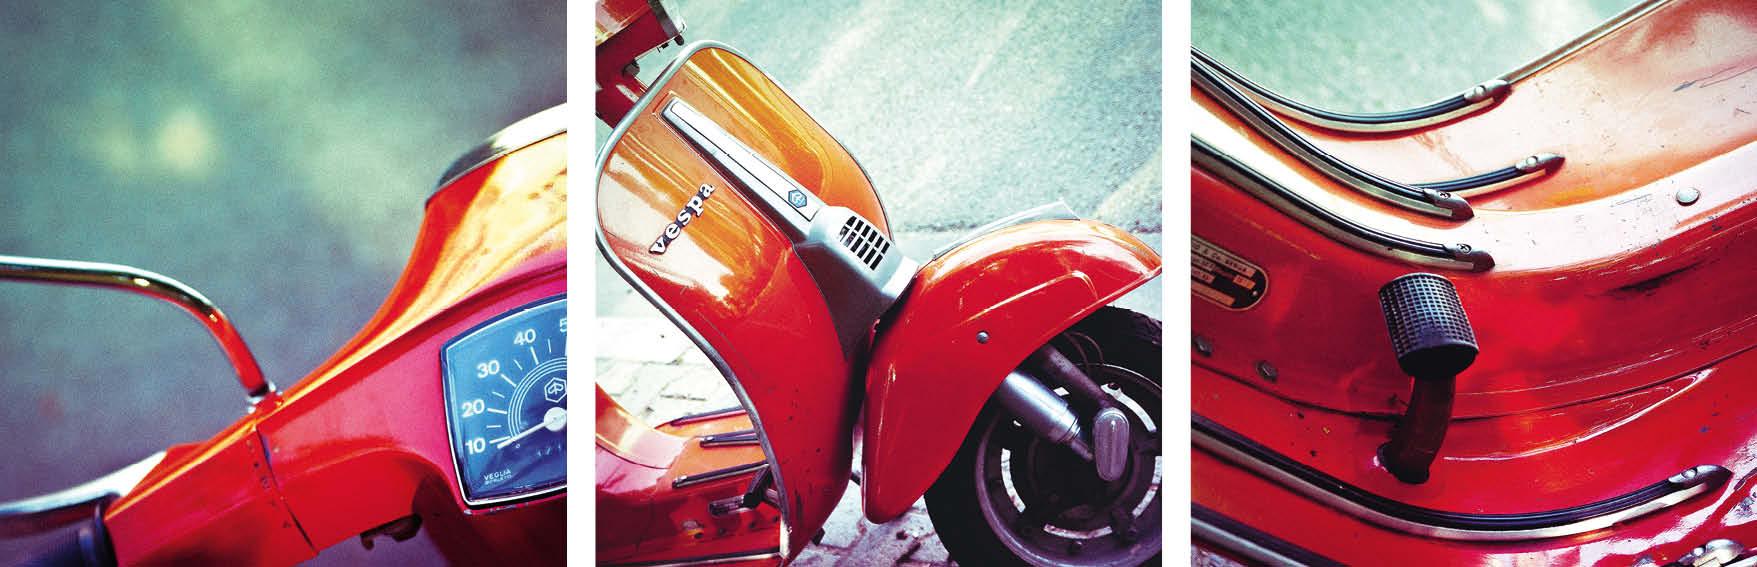 Rosso – Roman Pretot, Serien-Nr.: 361-006